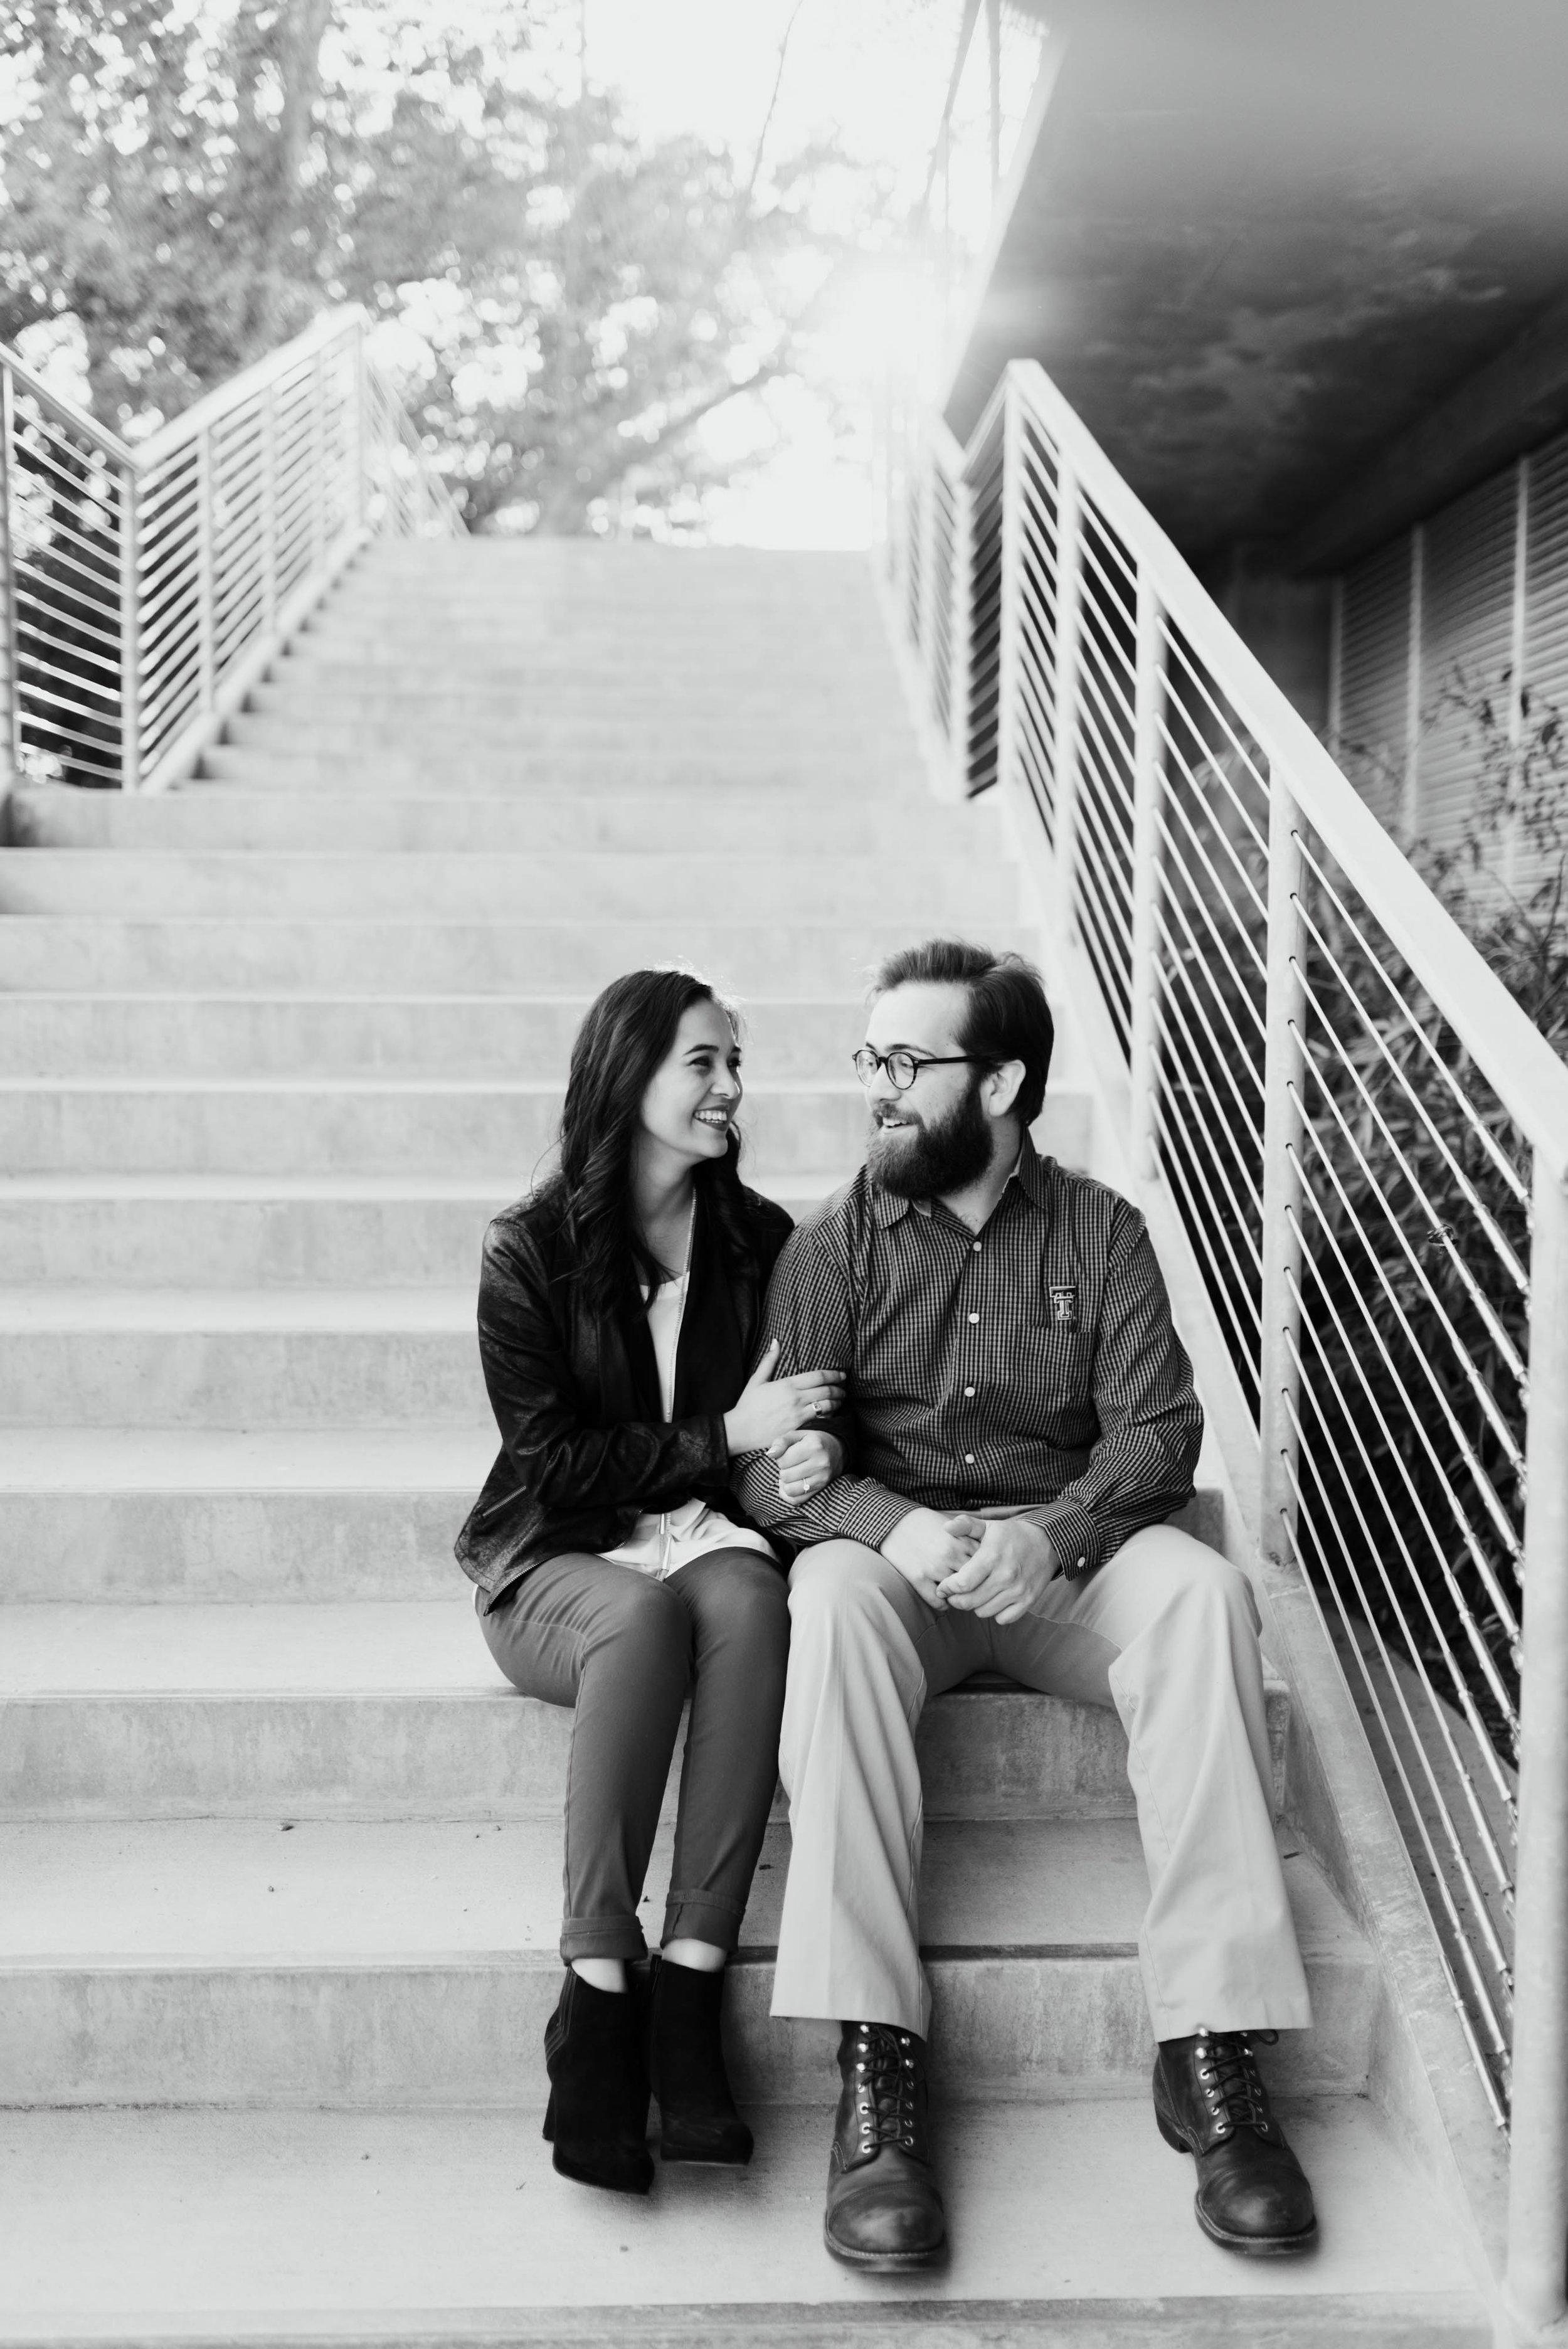 Houston Engagement Session | Houston Natural Light Photographer | www.jordanmitchellphotography.com